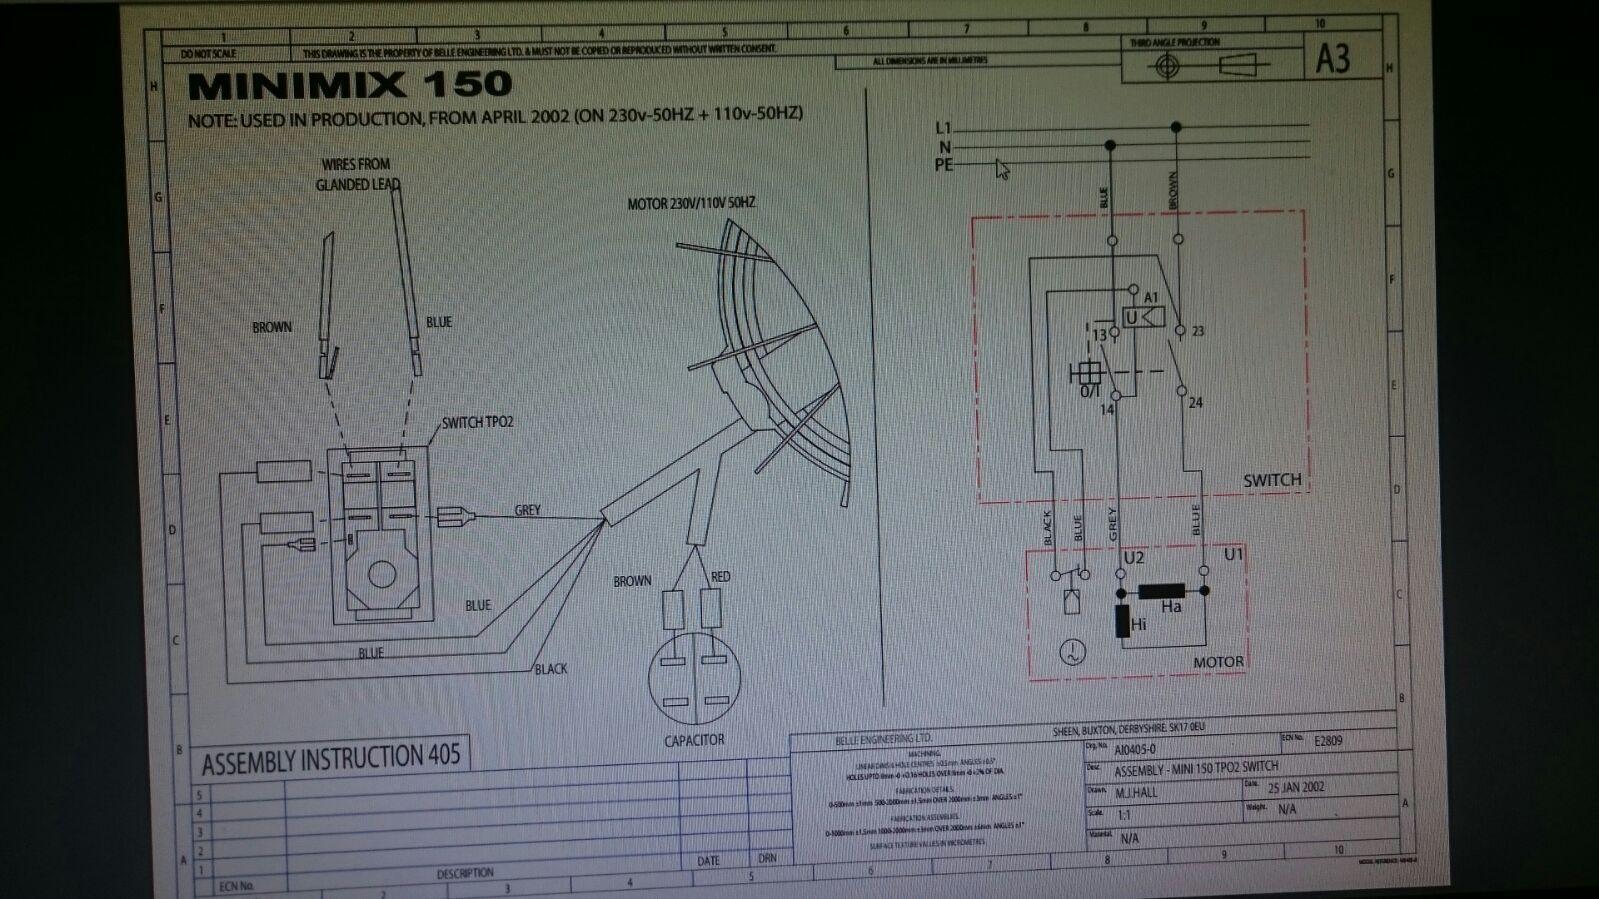 Belle cement concrete mixer v on off switch minimix